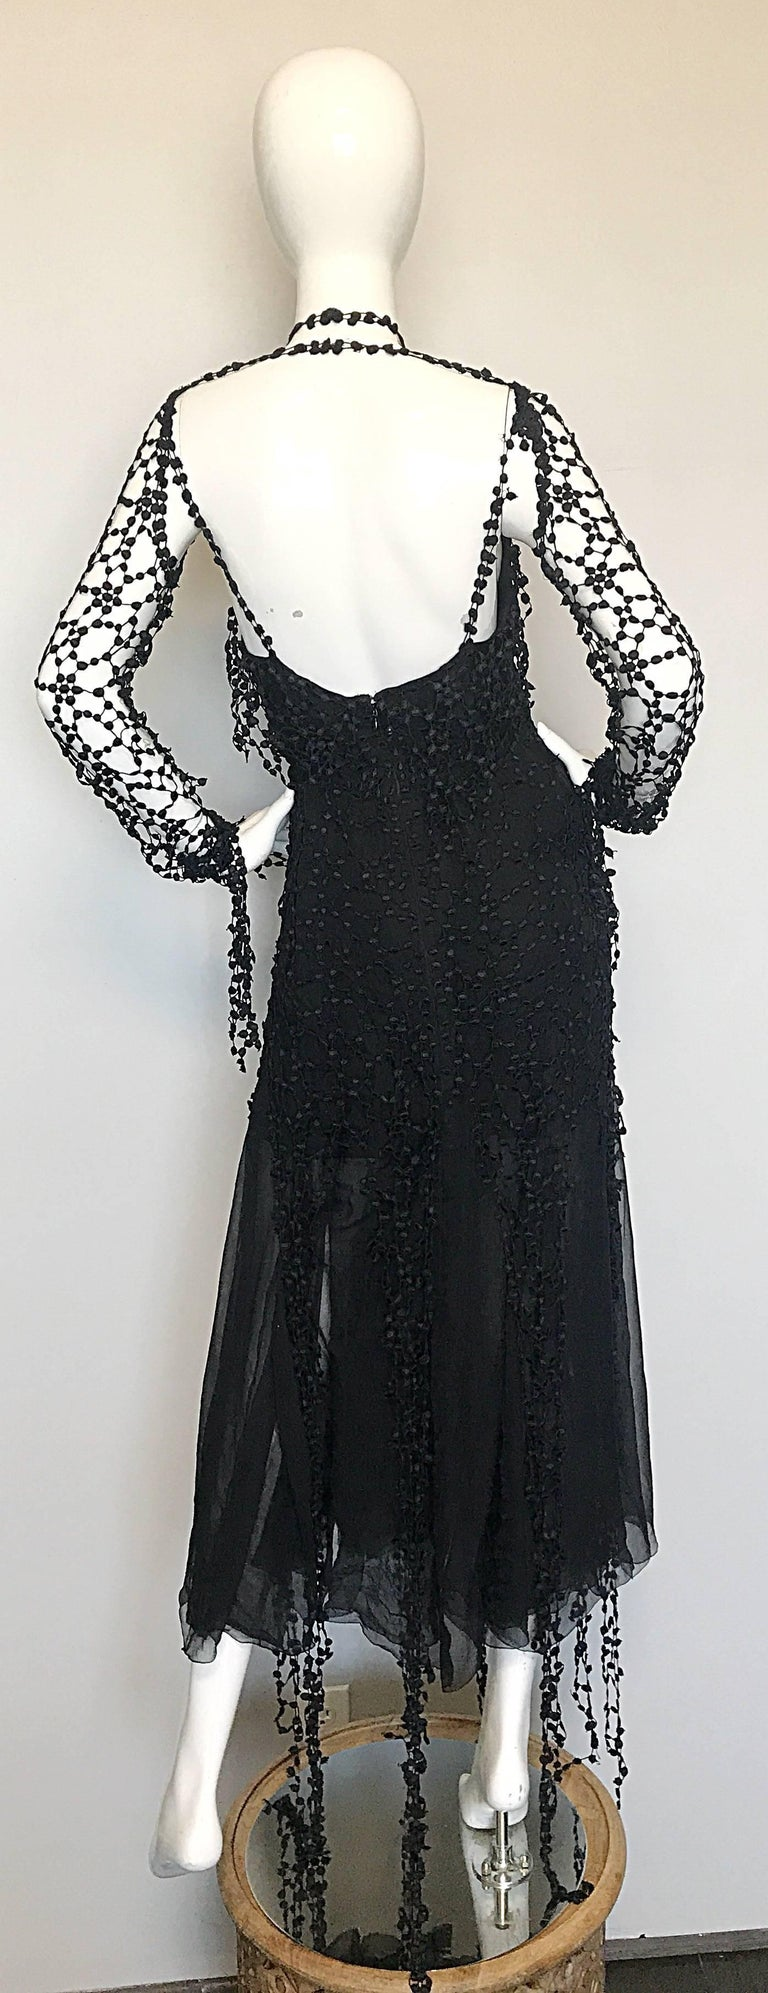 1990s Karl Lagerfeld Vintage ' Spiderweb ' Black Silk Chiffon Vintage 90s Dress 3